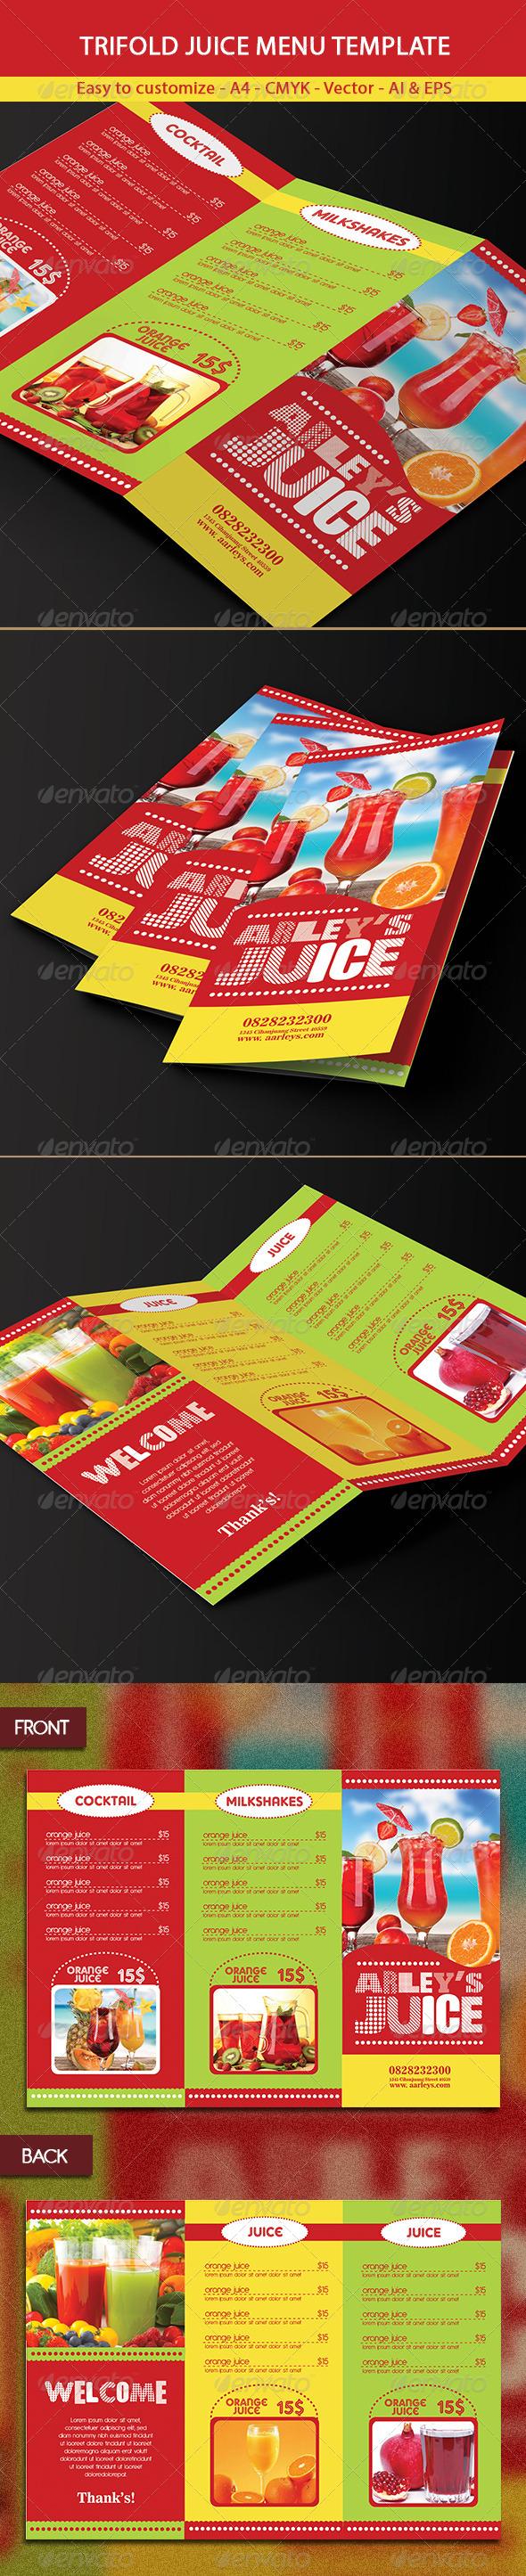 Trifold Drinks Menu Template - Food Menus Print Templates